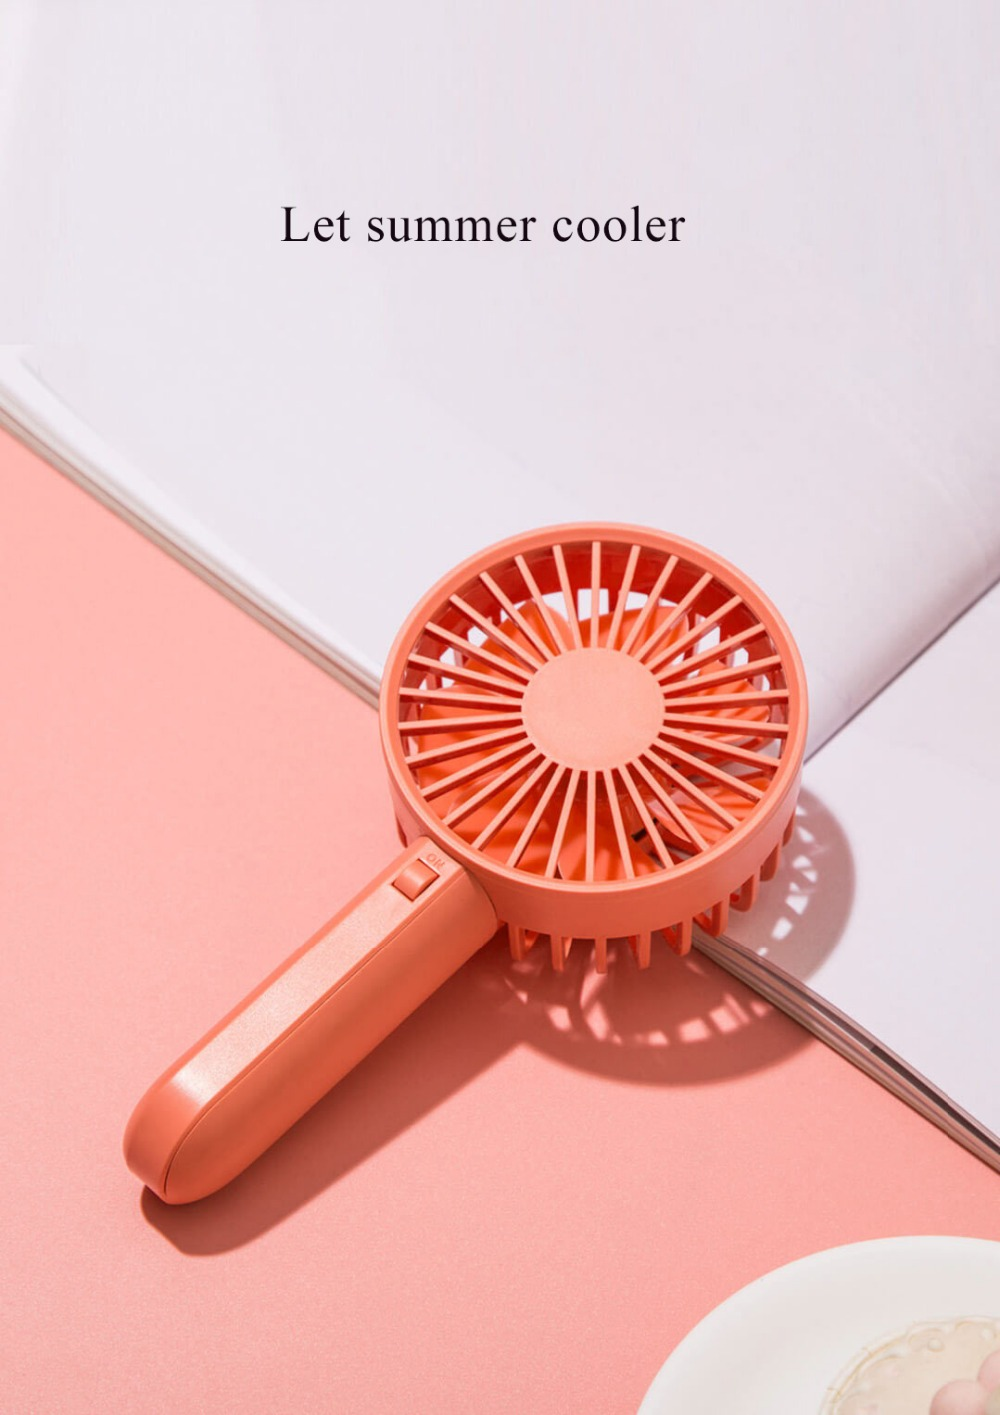 Xiaomi VH U hordozható kézi ventilátor, narancs